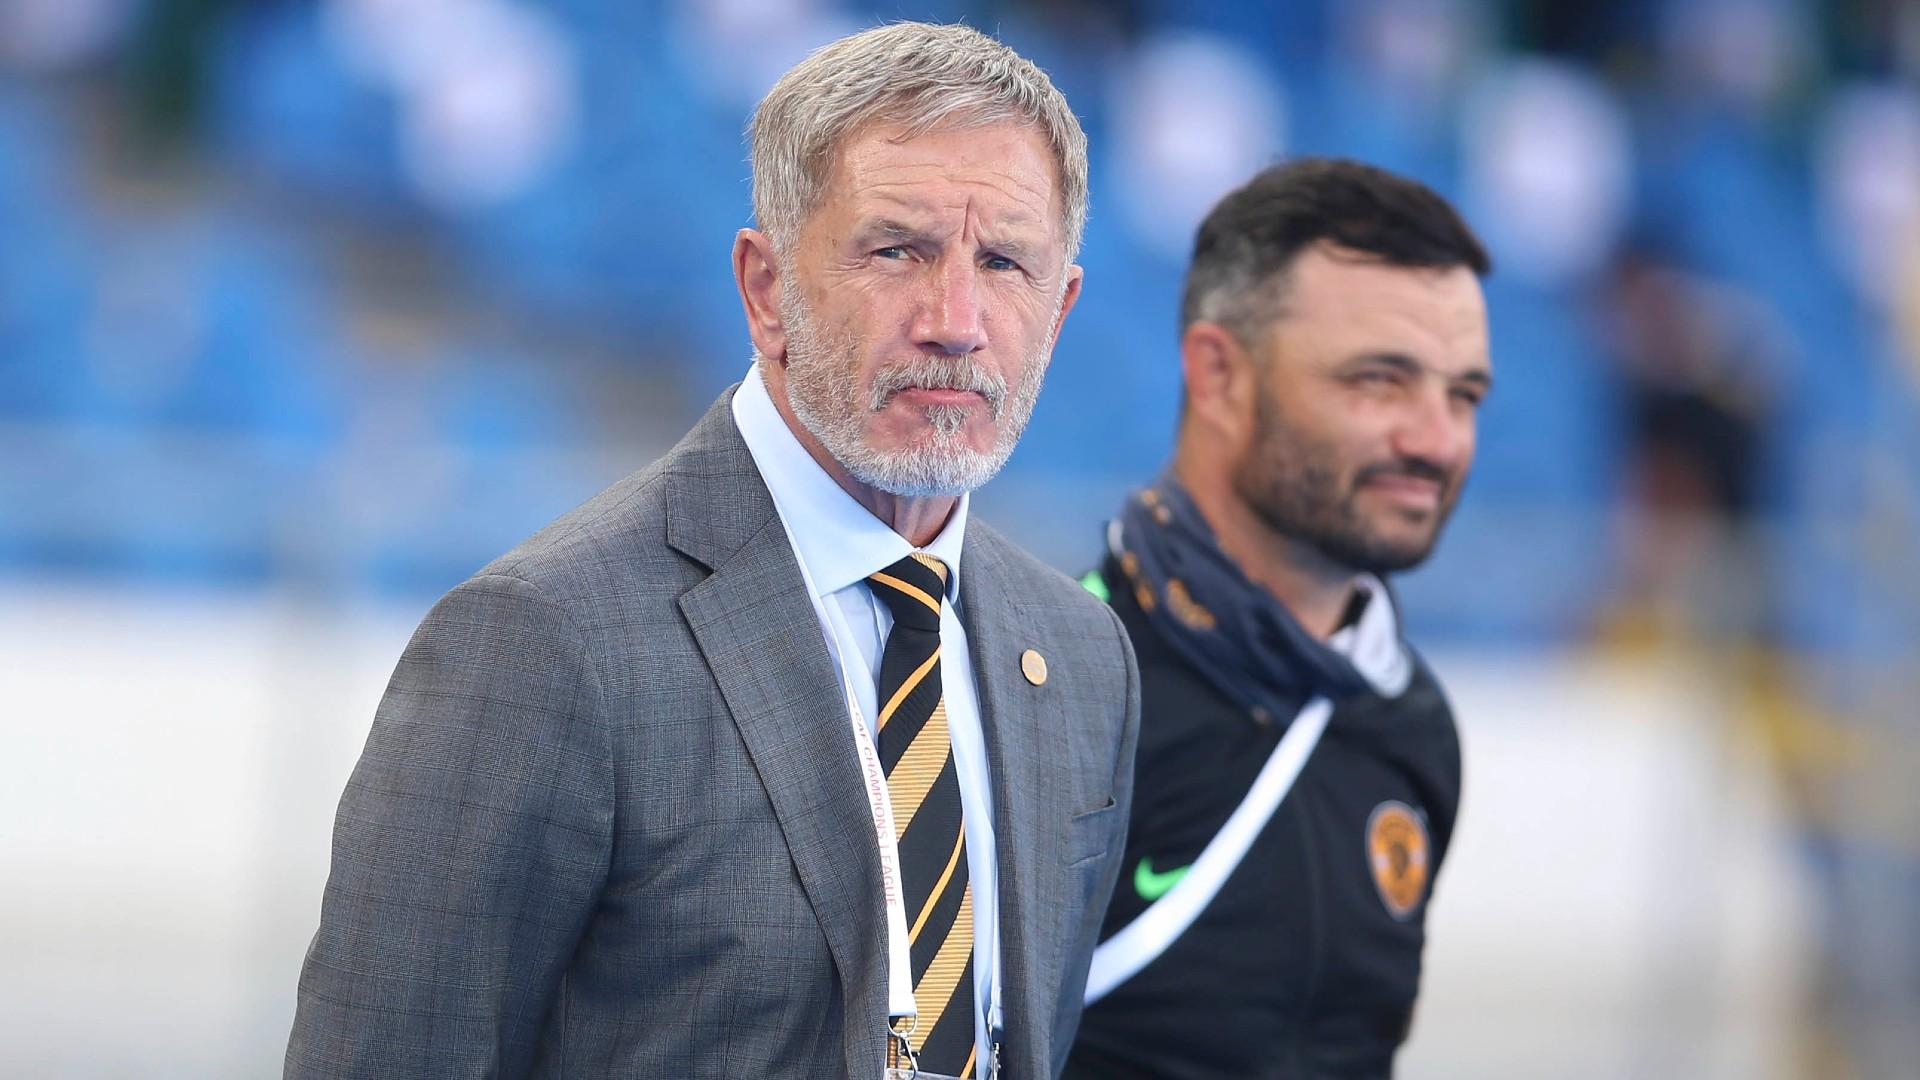 Baxter provides update on whether Billiat will start for Kaizer Chiefs against Mamelodi Sundowns